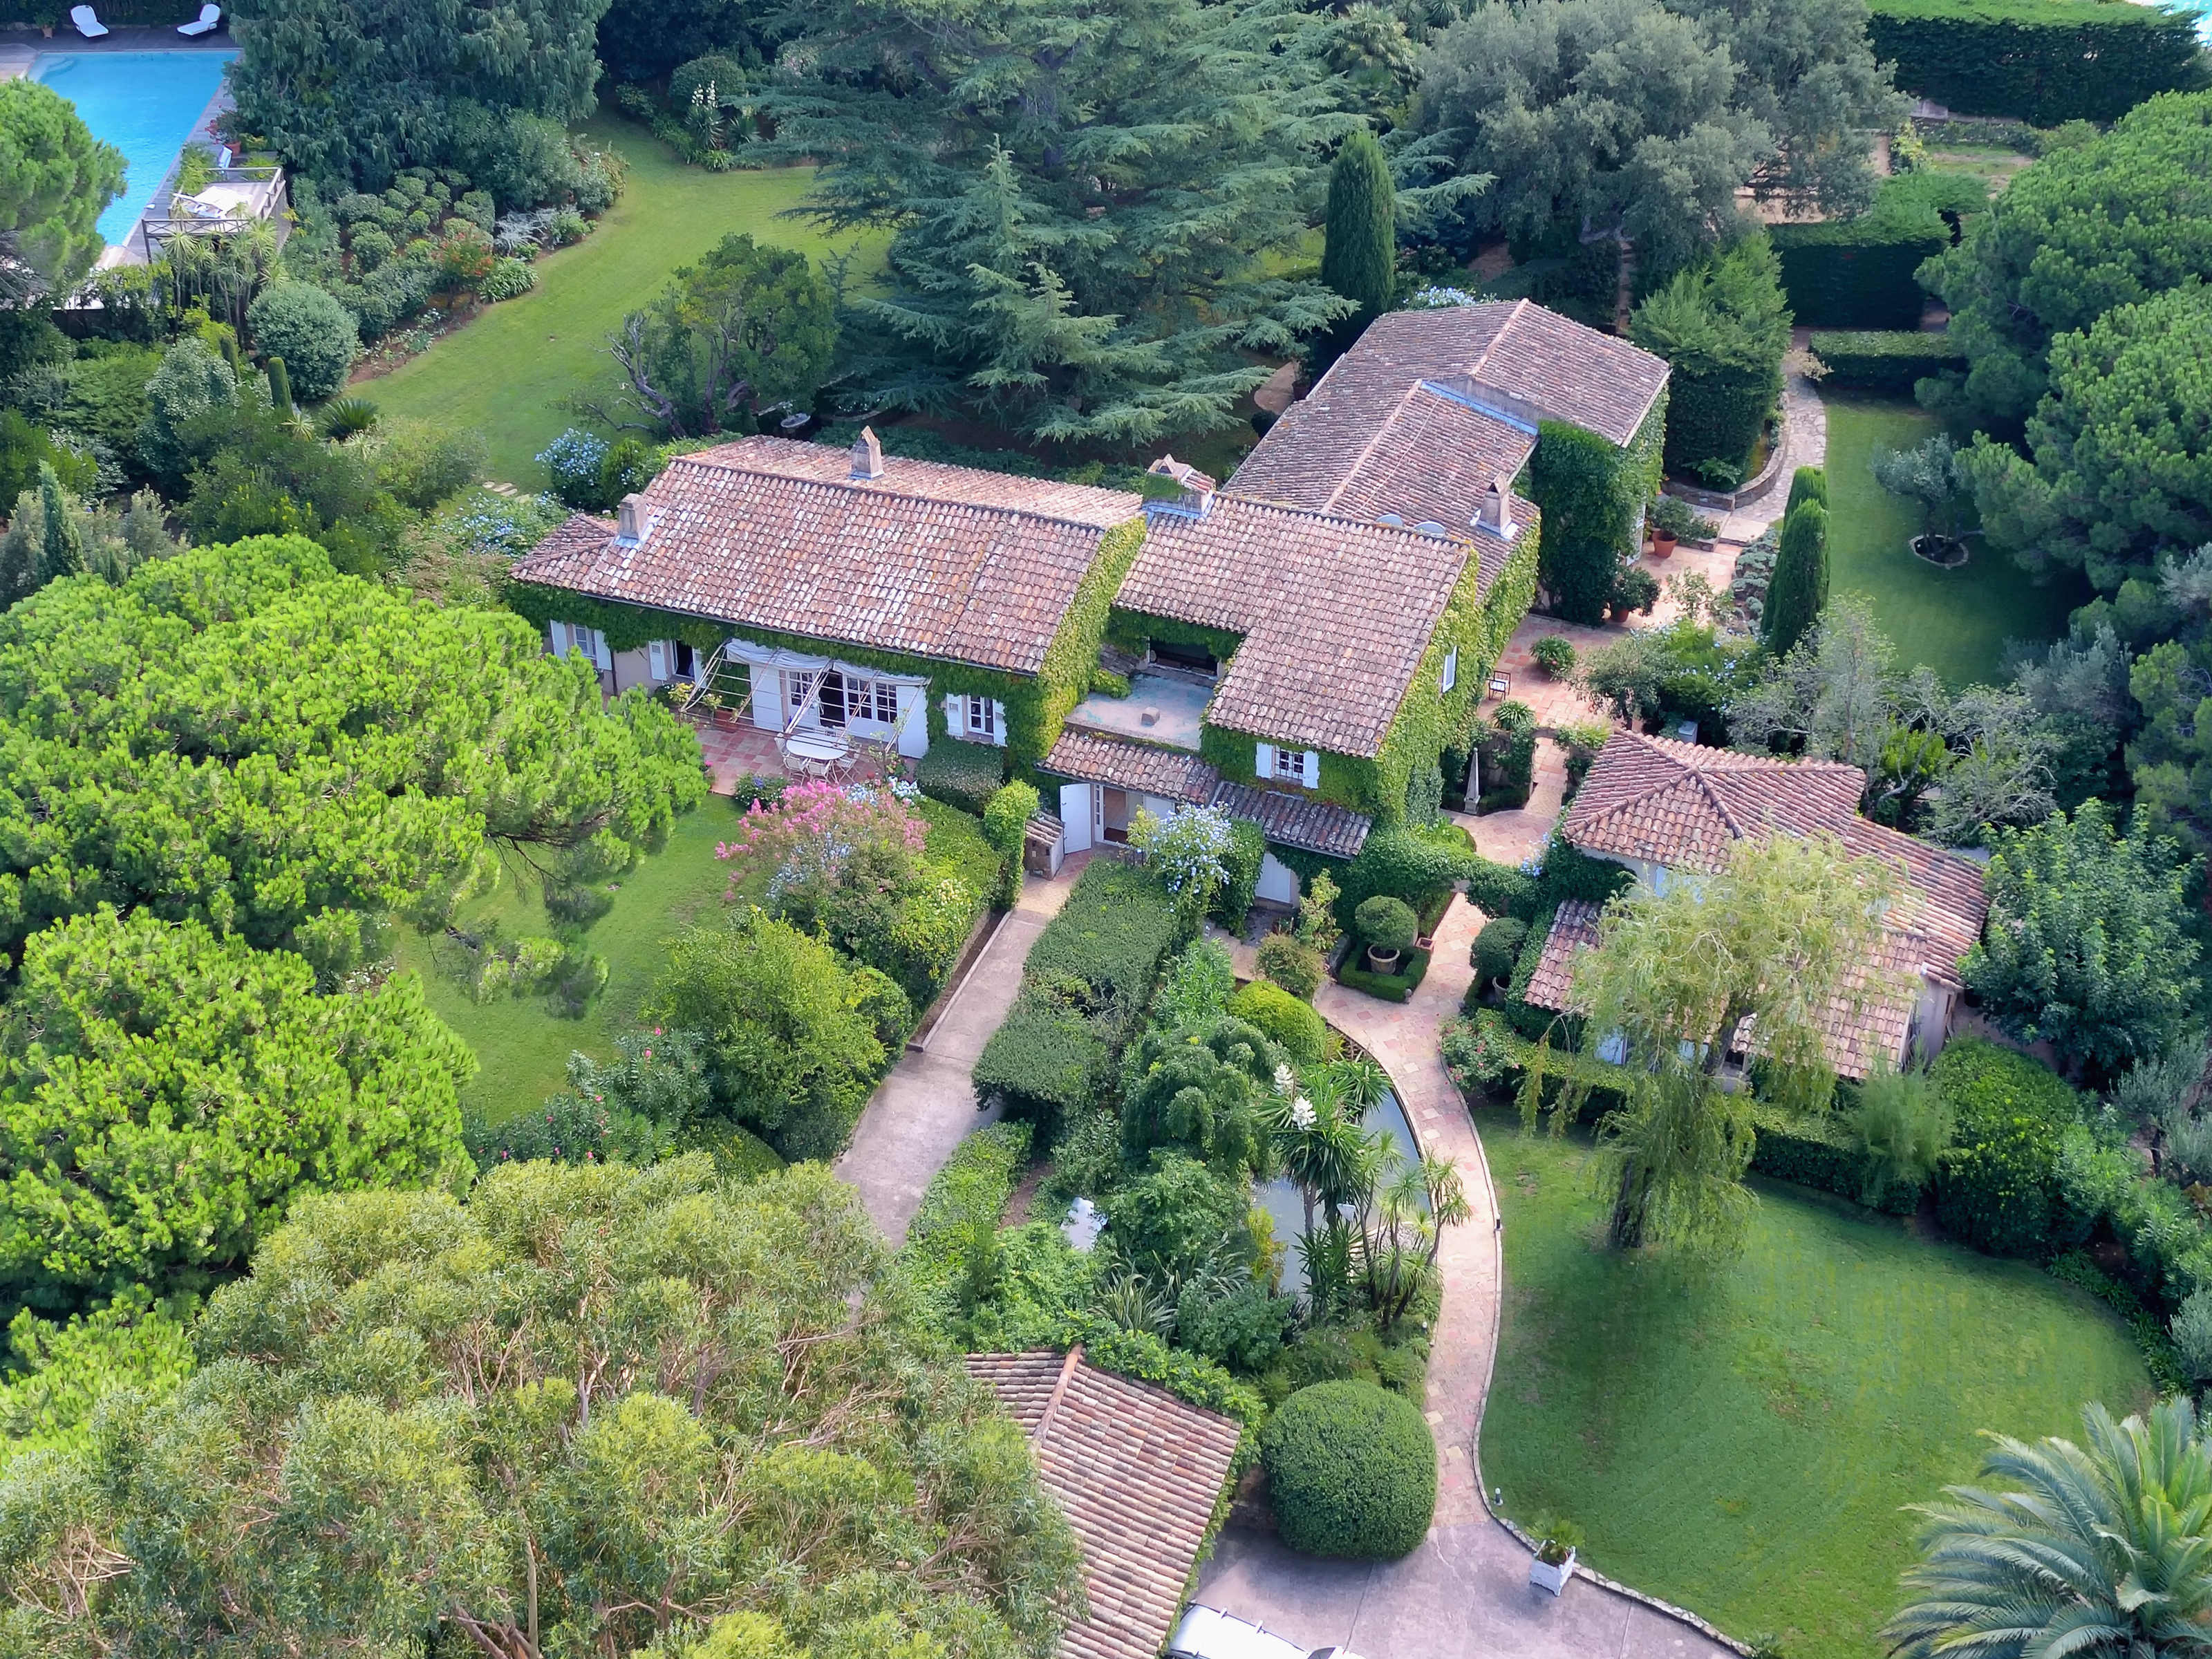 Single Family Home for Sale at Exceptional provençal villa in walking distance tothe town centre and beaches Saint Tropez, Provence-Alpes-Cote D'Azur 83990 France